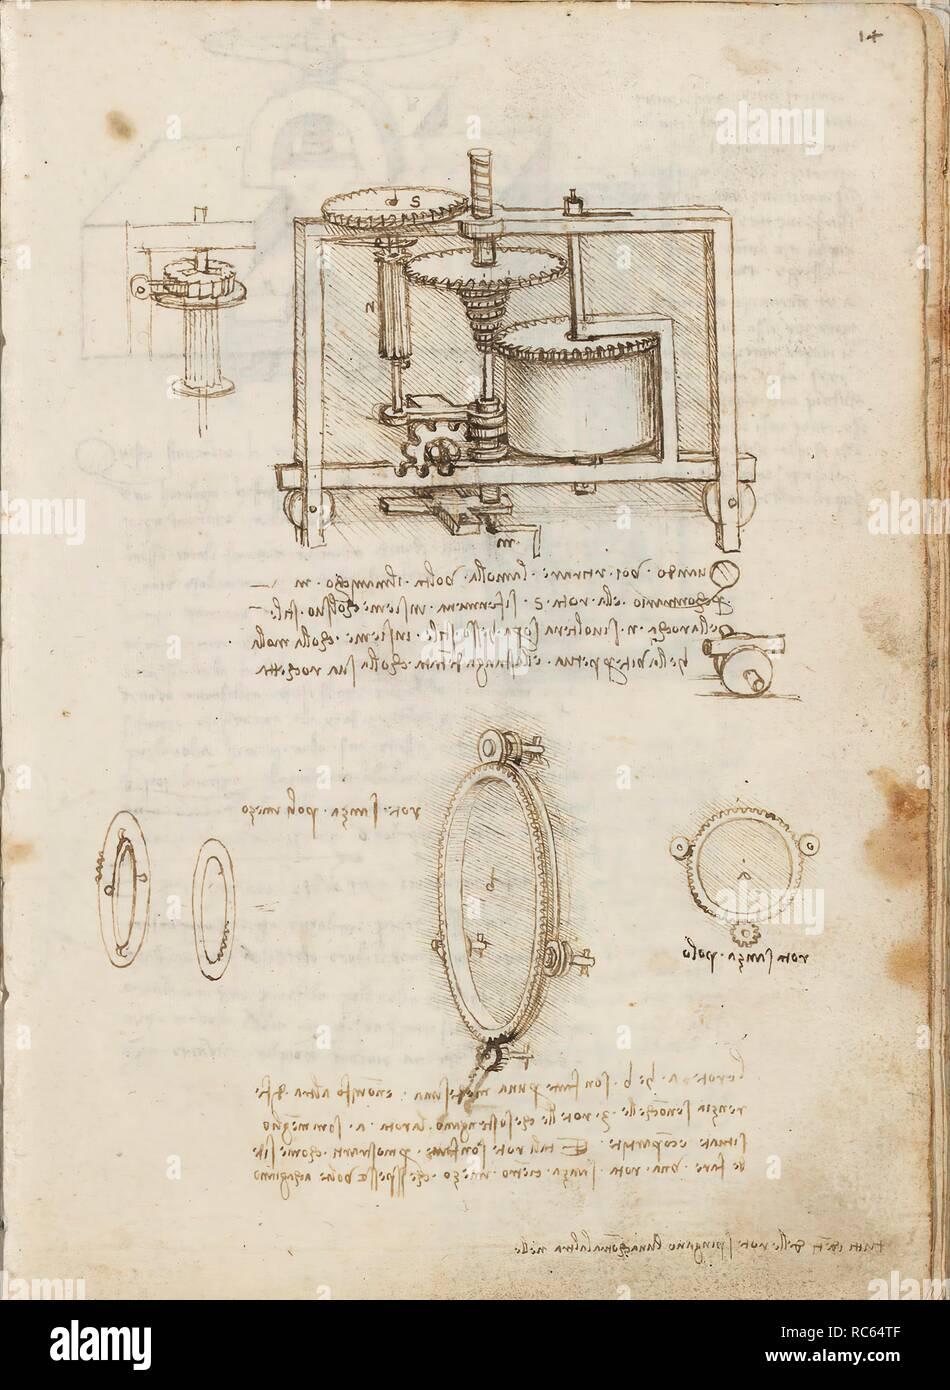 hight resolution of folio f 14r codex madrid i ms 8937 treaty of statics and mechanics 192 folios with 384 pages internal format 215 x 145 mm